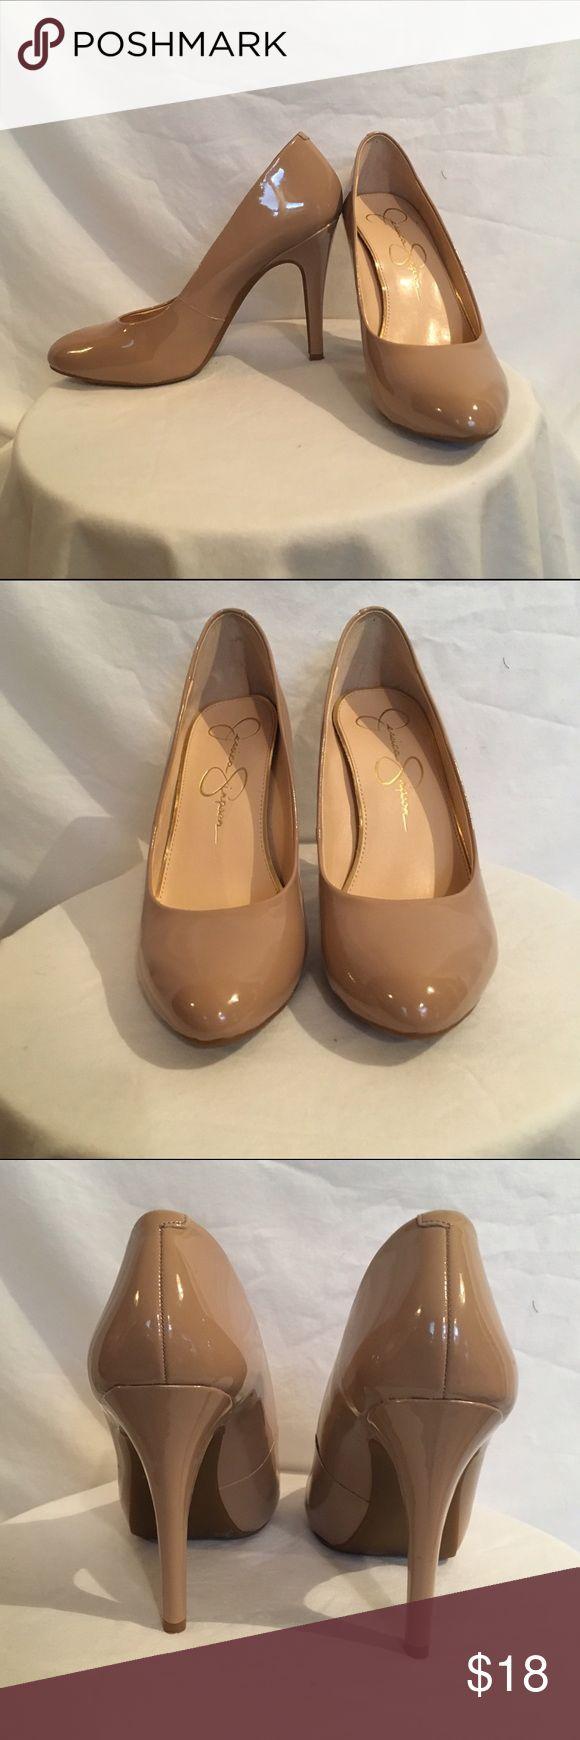 Jessica Simpson Nude Heels Like new patent Jessica Simpson heels in nude. No scuffs. Jessica Simpson Shoes Heels